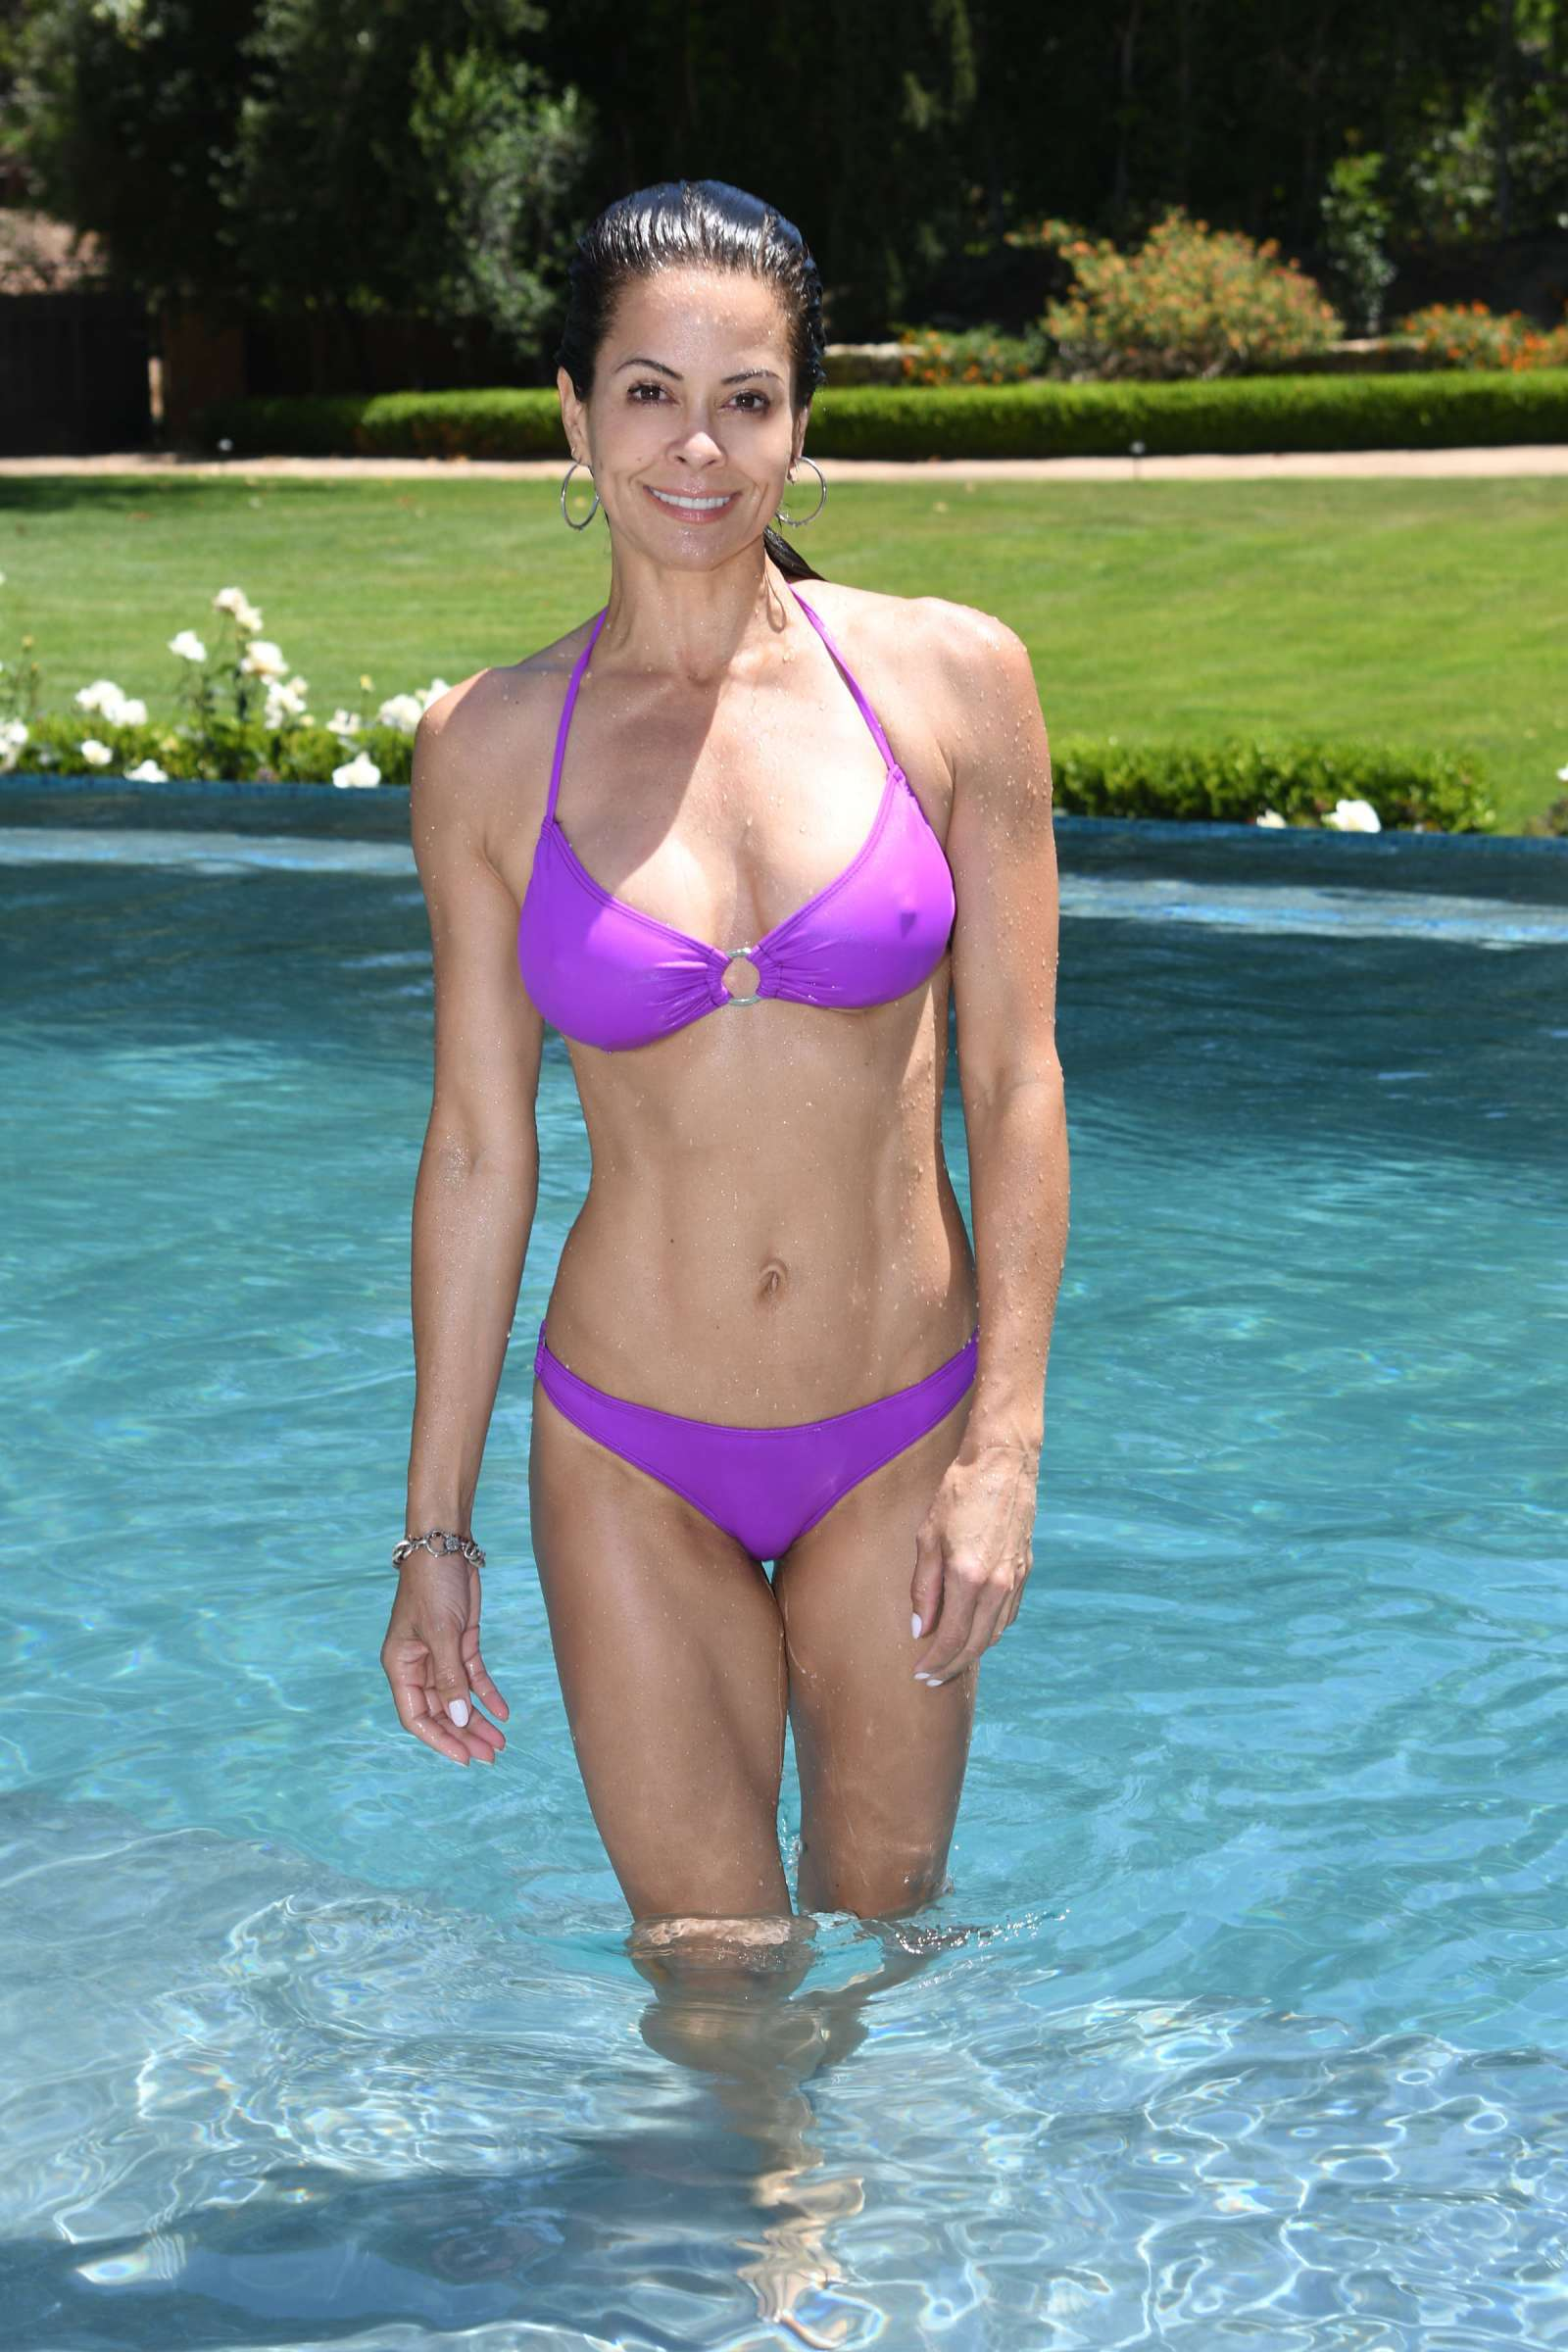 Christine McGuinness Bikini | The Fappening. 2014-2020 celebrity photo leaks!